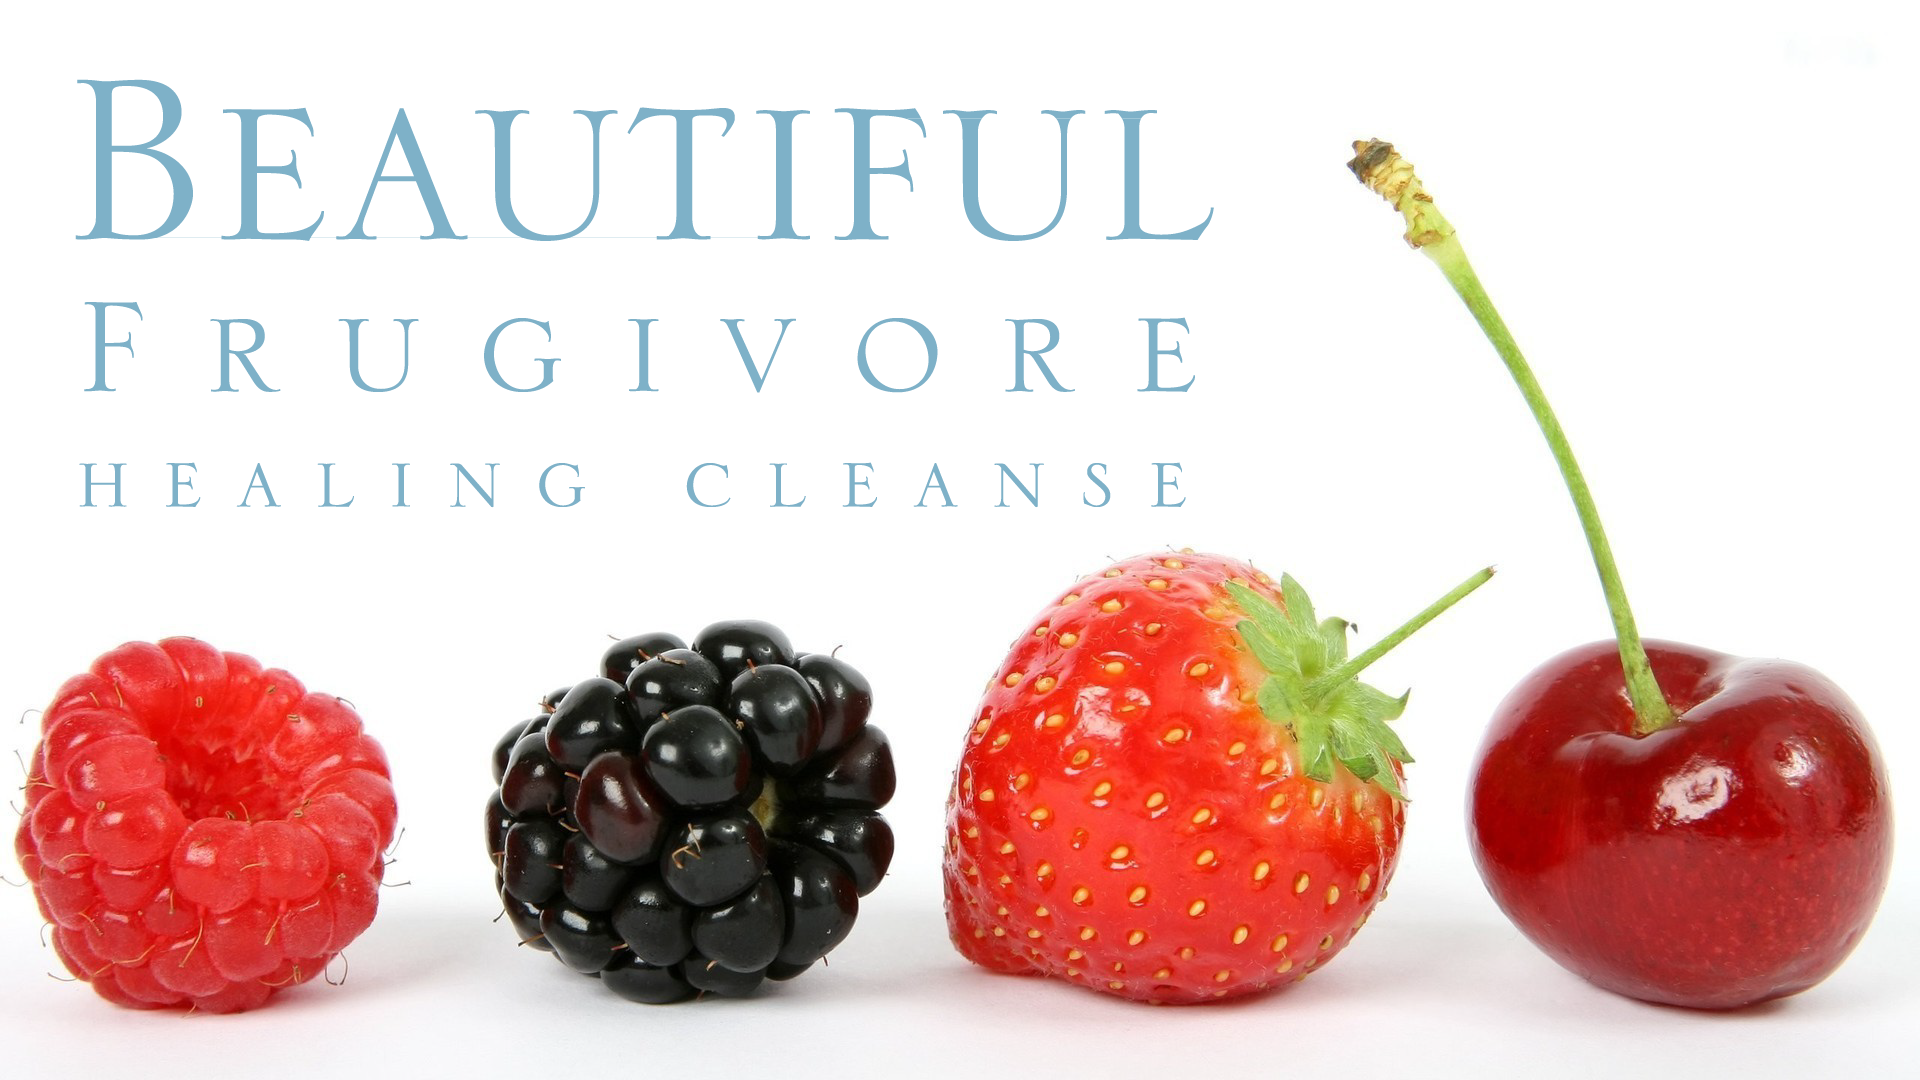 Steven Budden Beautiful Frugivore Healing Cleanse